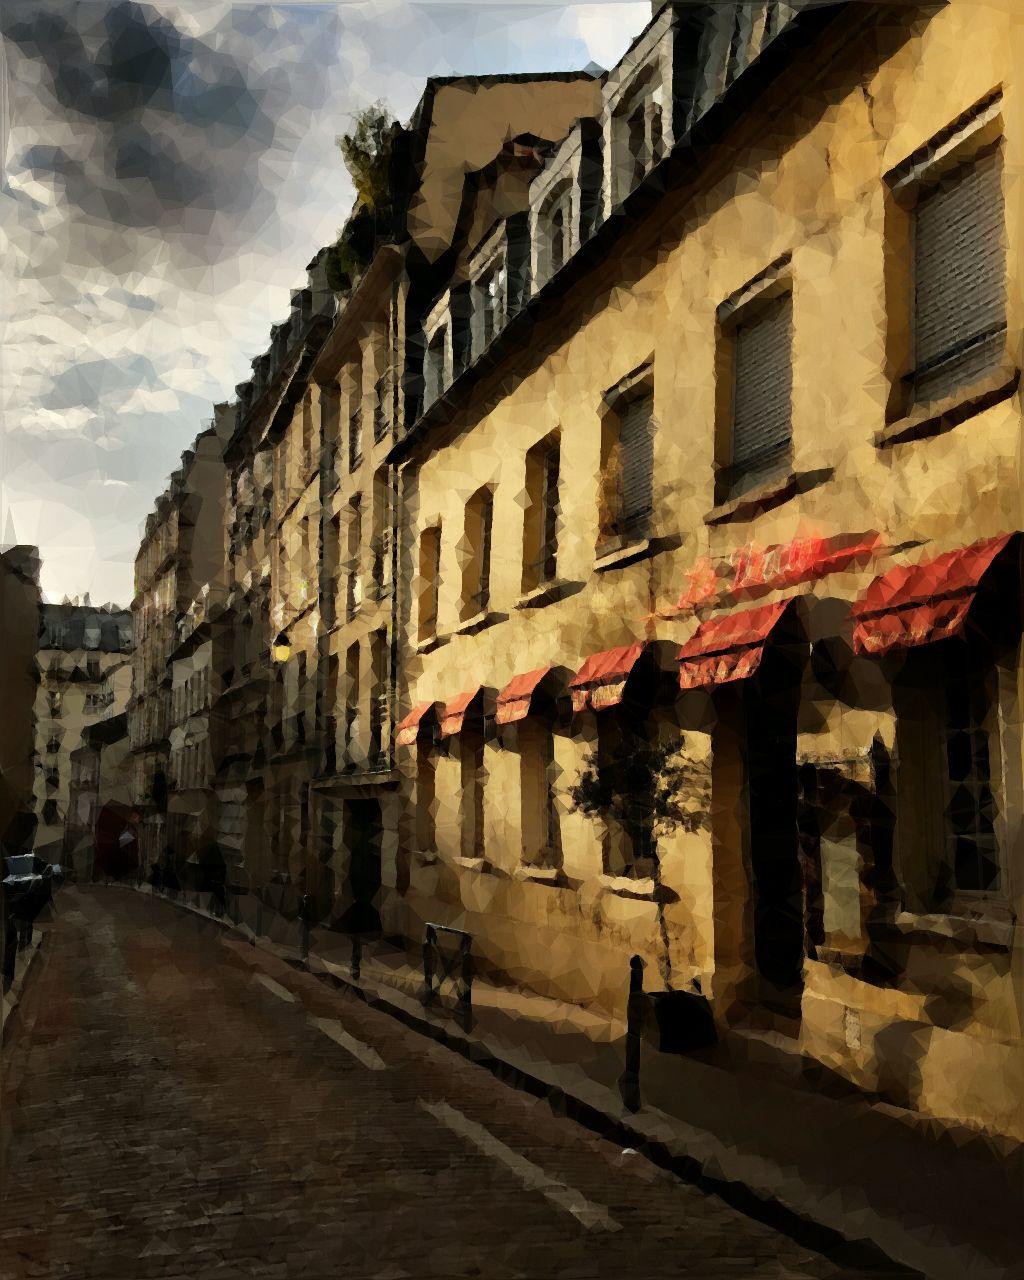 #undimancheàparis #parisvillage #encapitale #PARISVILLAGE  #mycityloveandstress